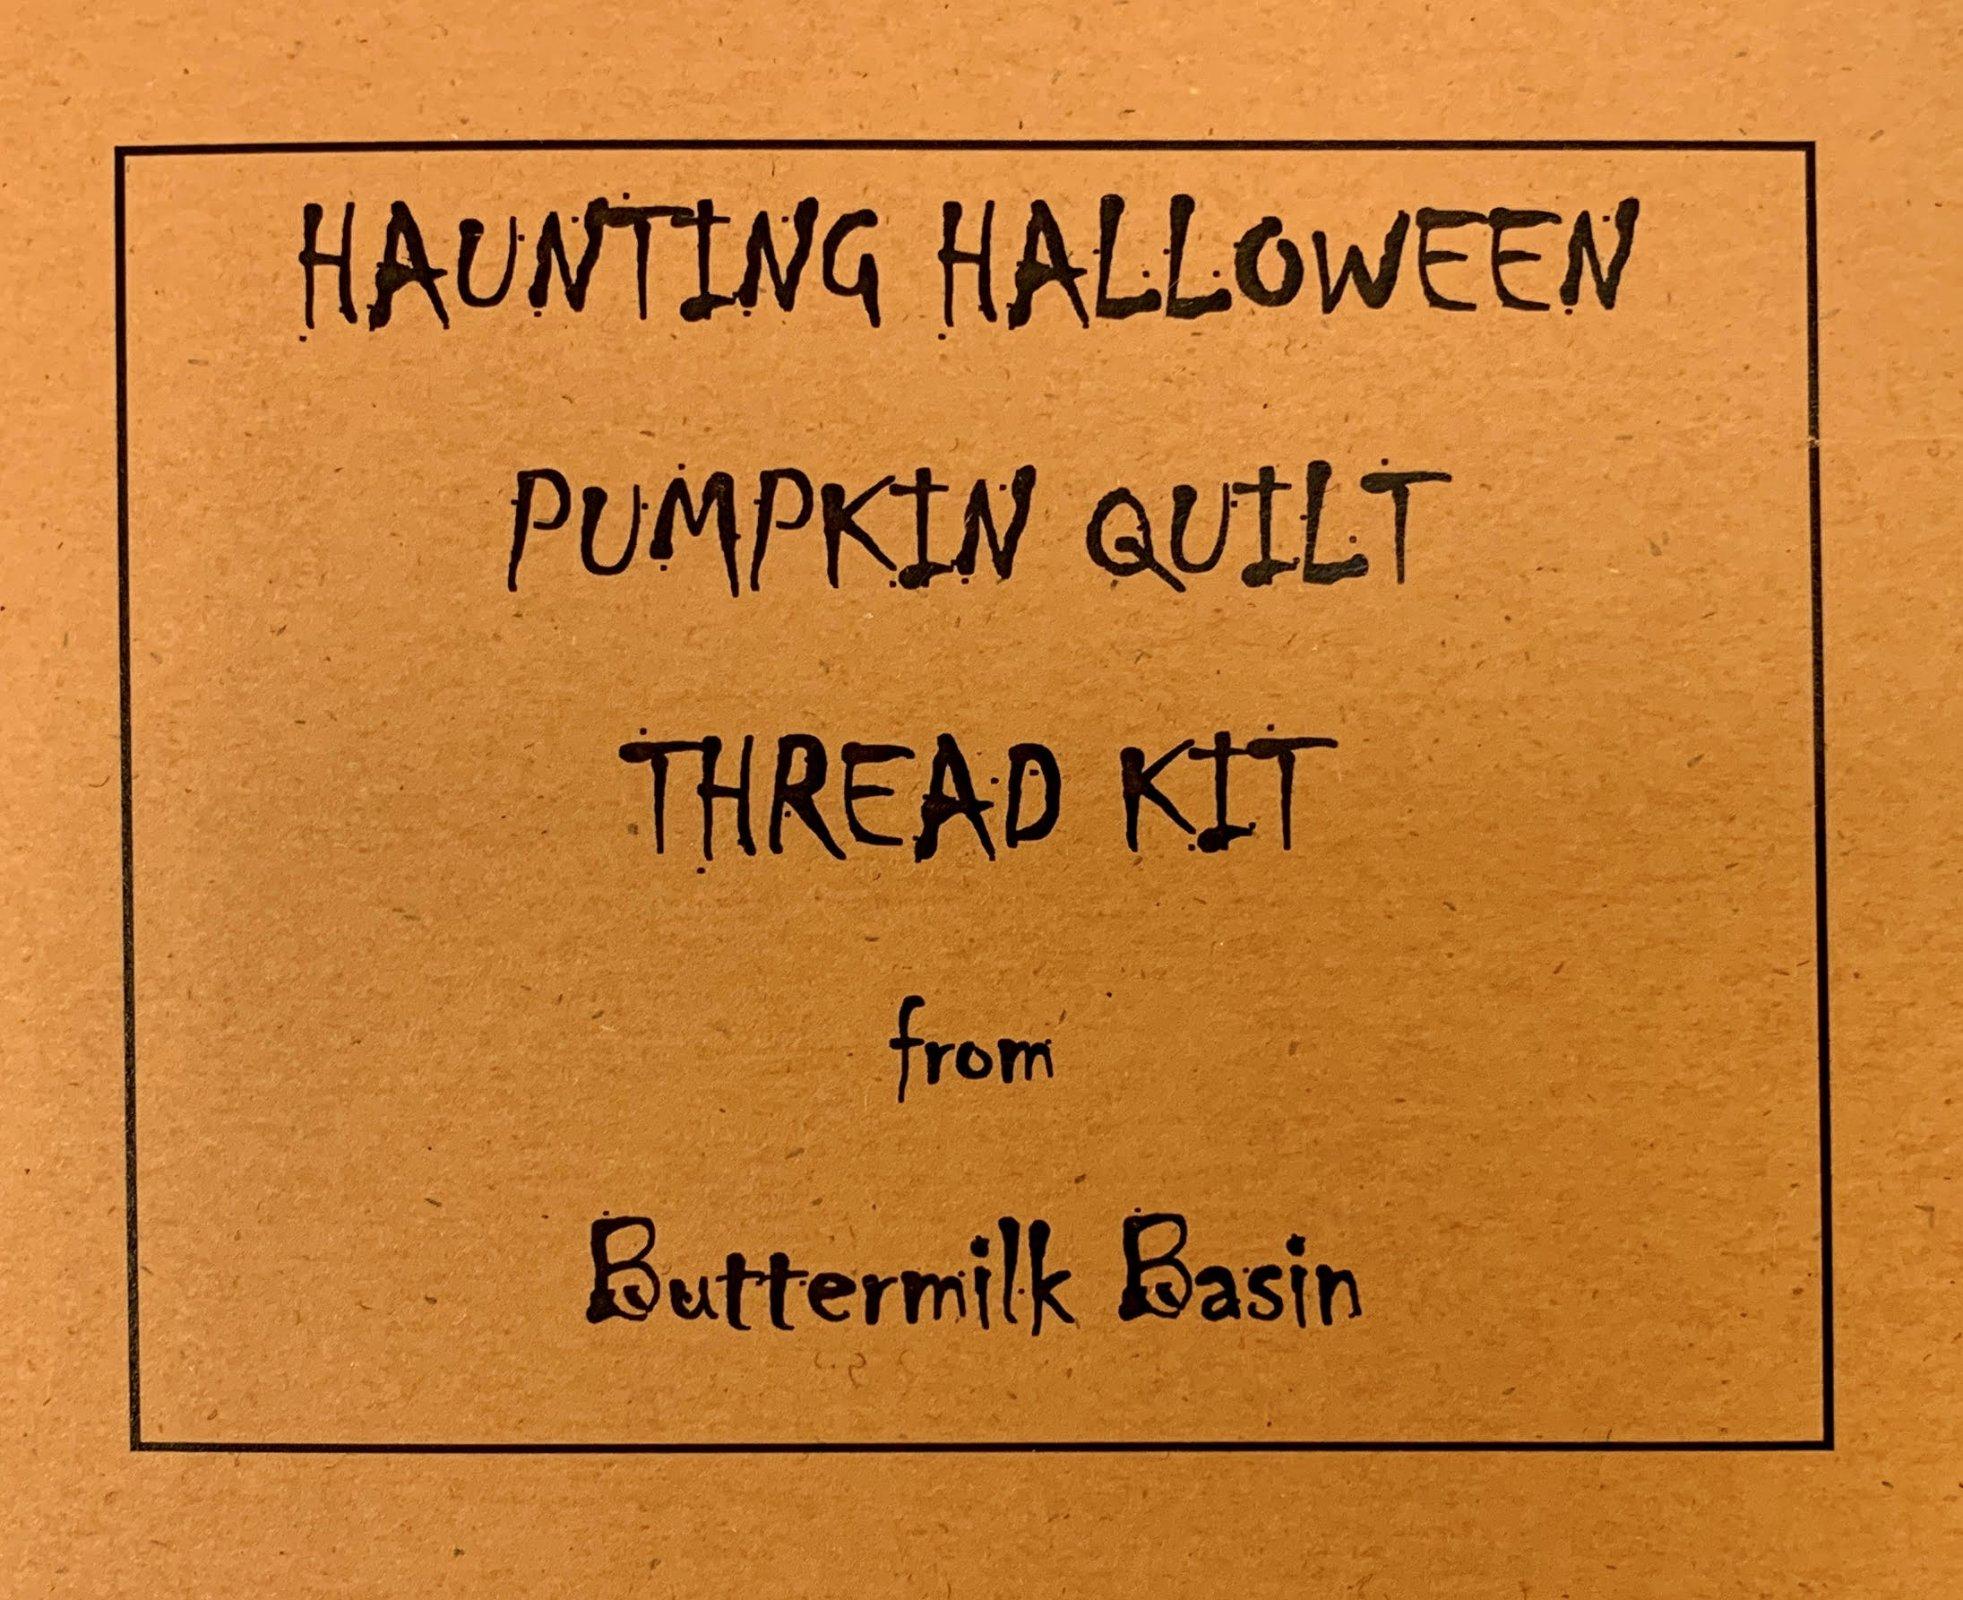 Haunting Halloween Pumpkin Quilt Thread Kit